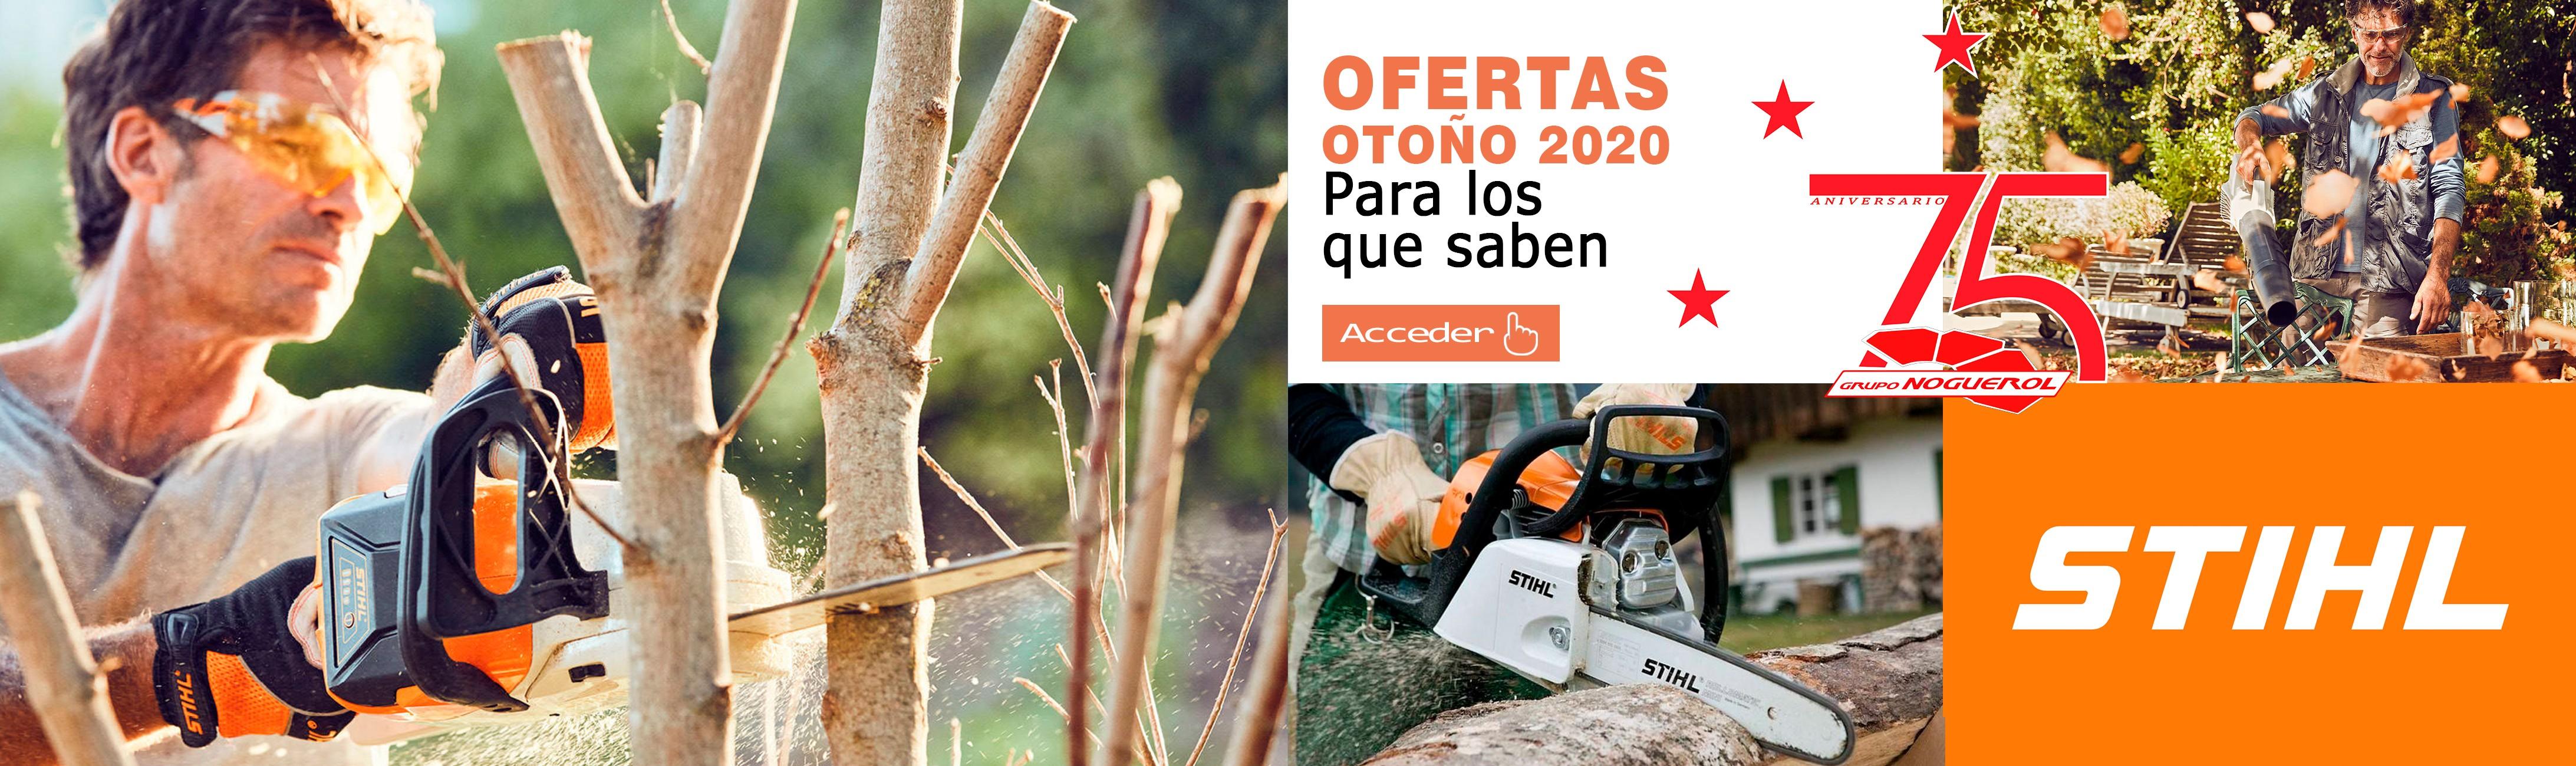 CAMPAÑA OTOÑO STIHL 2020